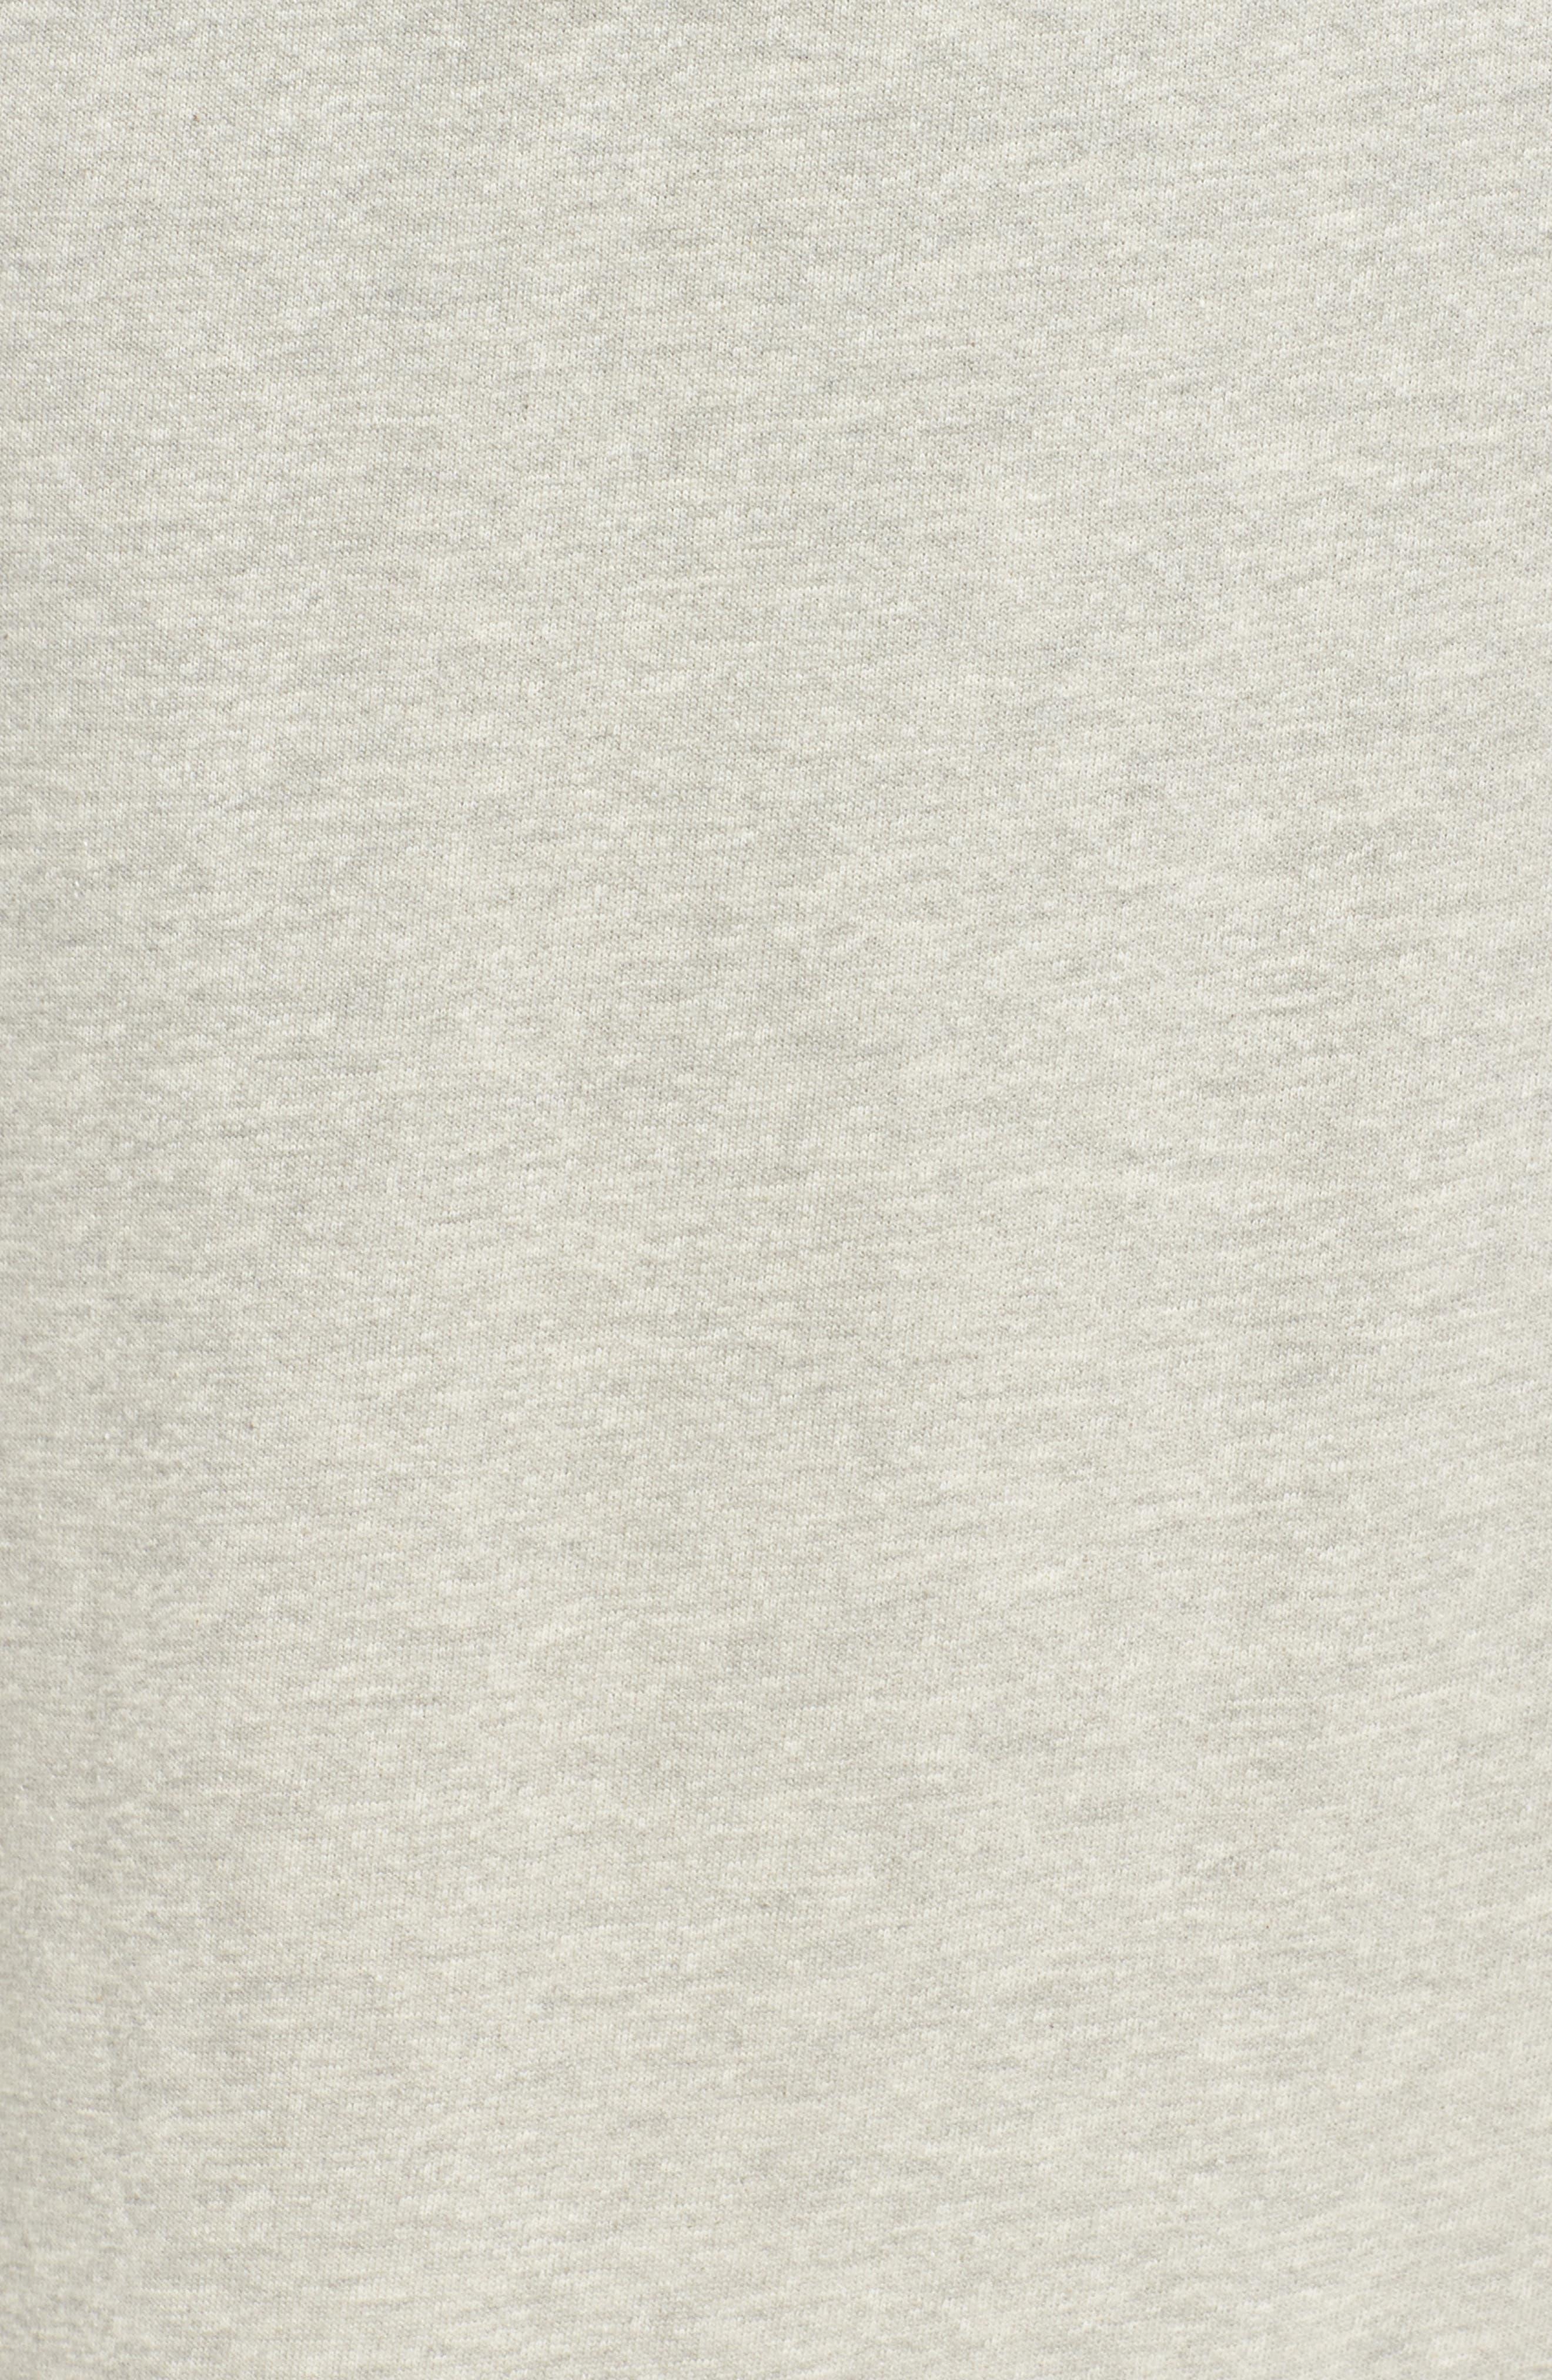 Drawstring Knit Skirt,                             Alternate thumbnail 6, color,                             030